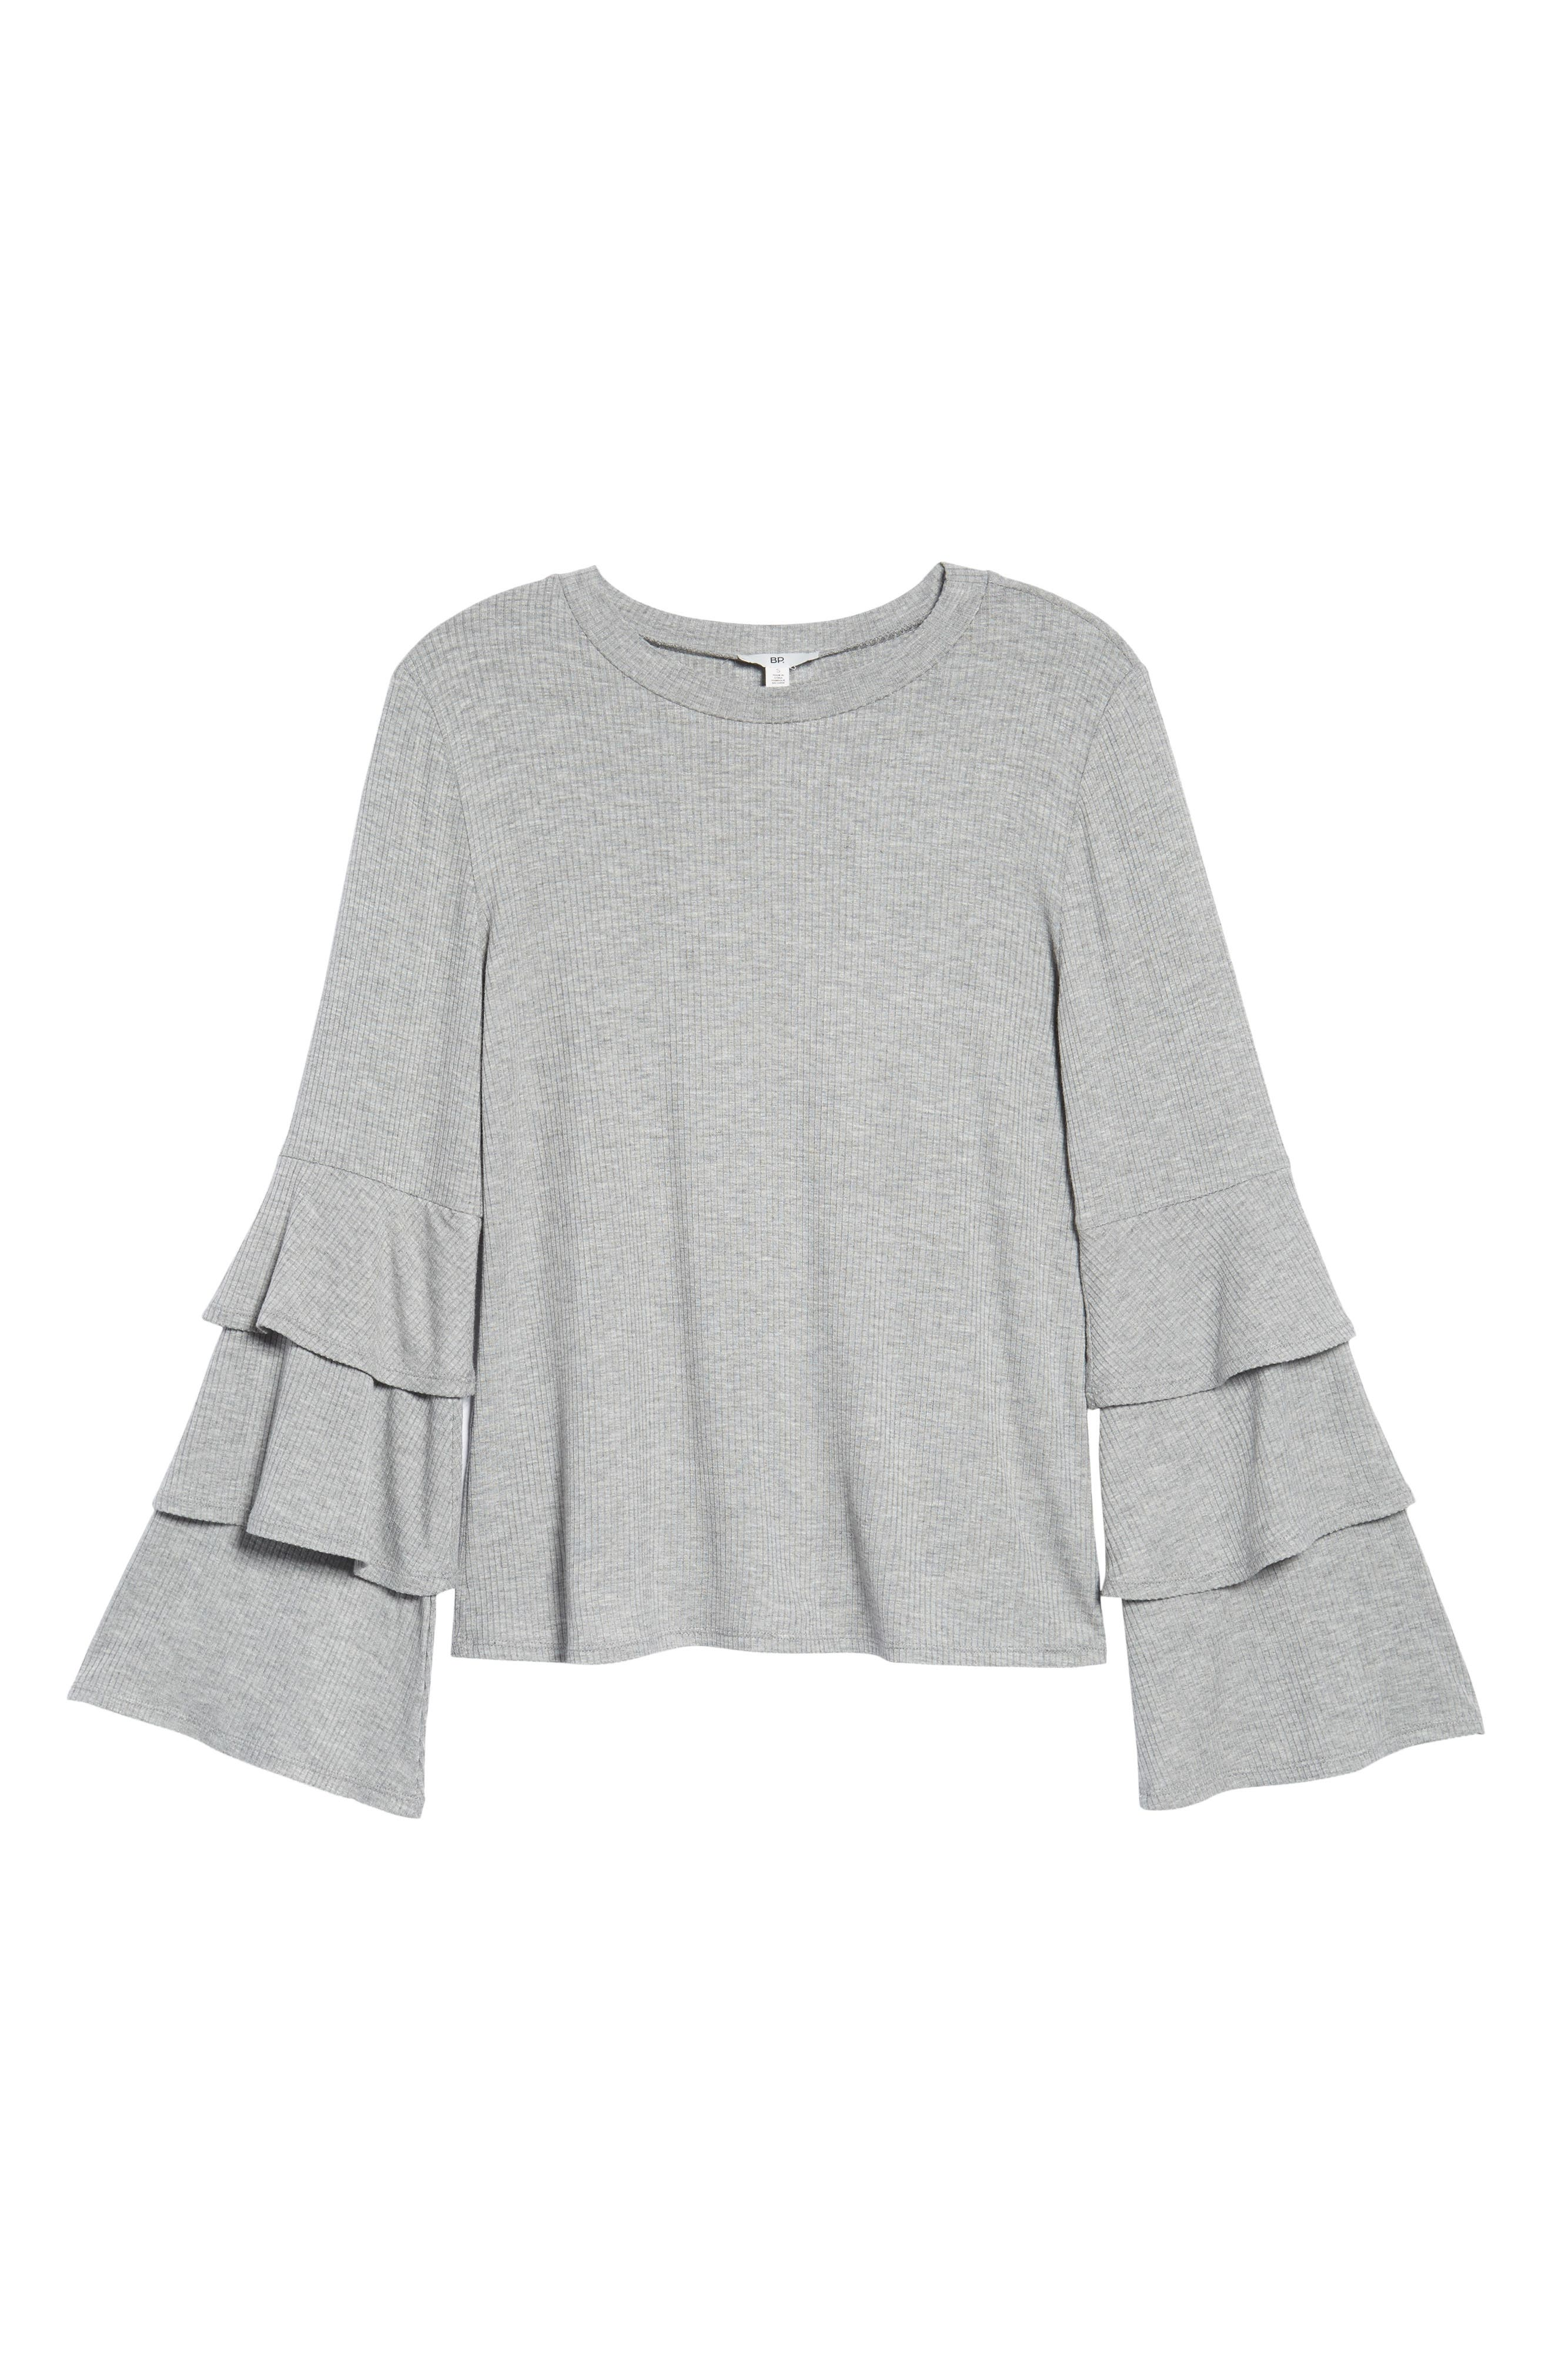 Ruffle Sleeve Ribbed Sweater,                             Alternate thumbnail 6, color,                             Grey Medium Heather